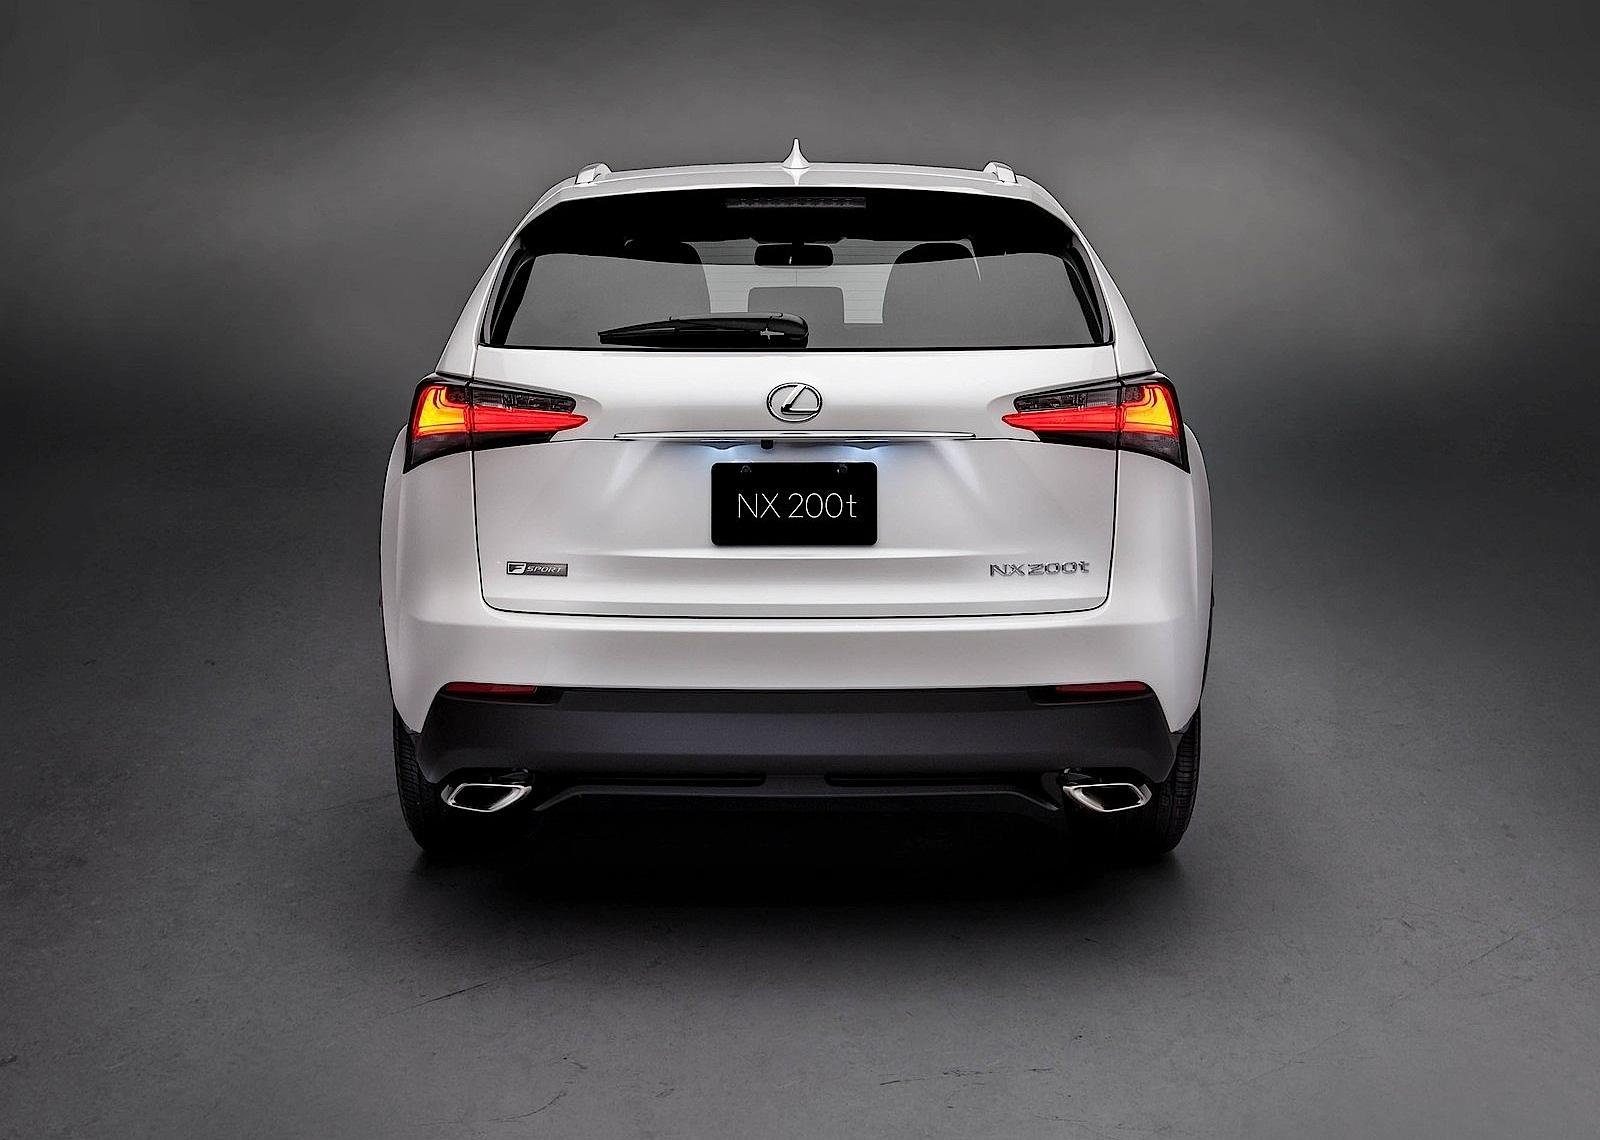 Lexus Nx 200T F Sport >> LEXUS NX specs - 2014, 2015, 2016, 2017 - autoevolution